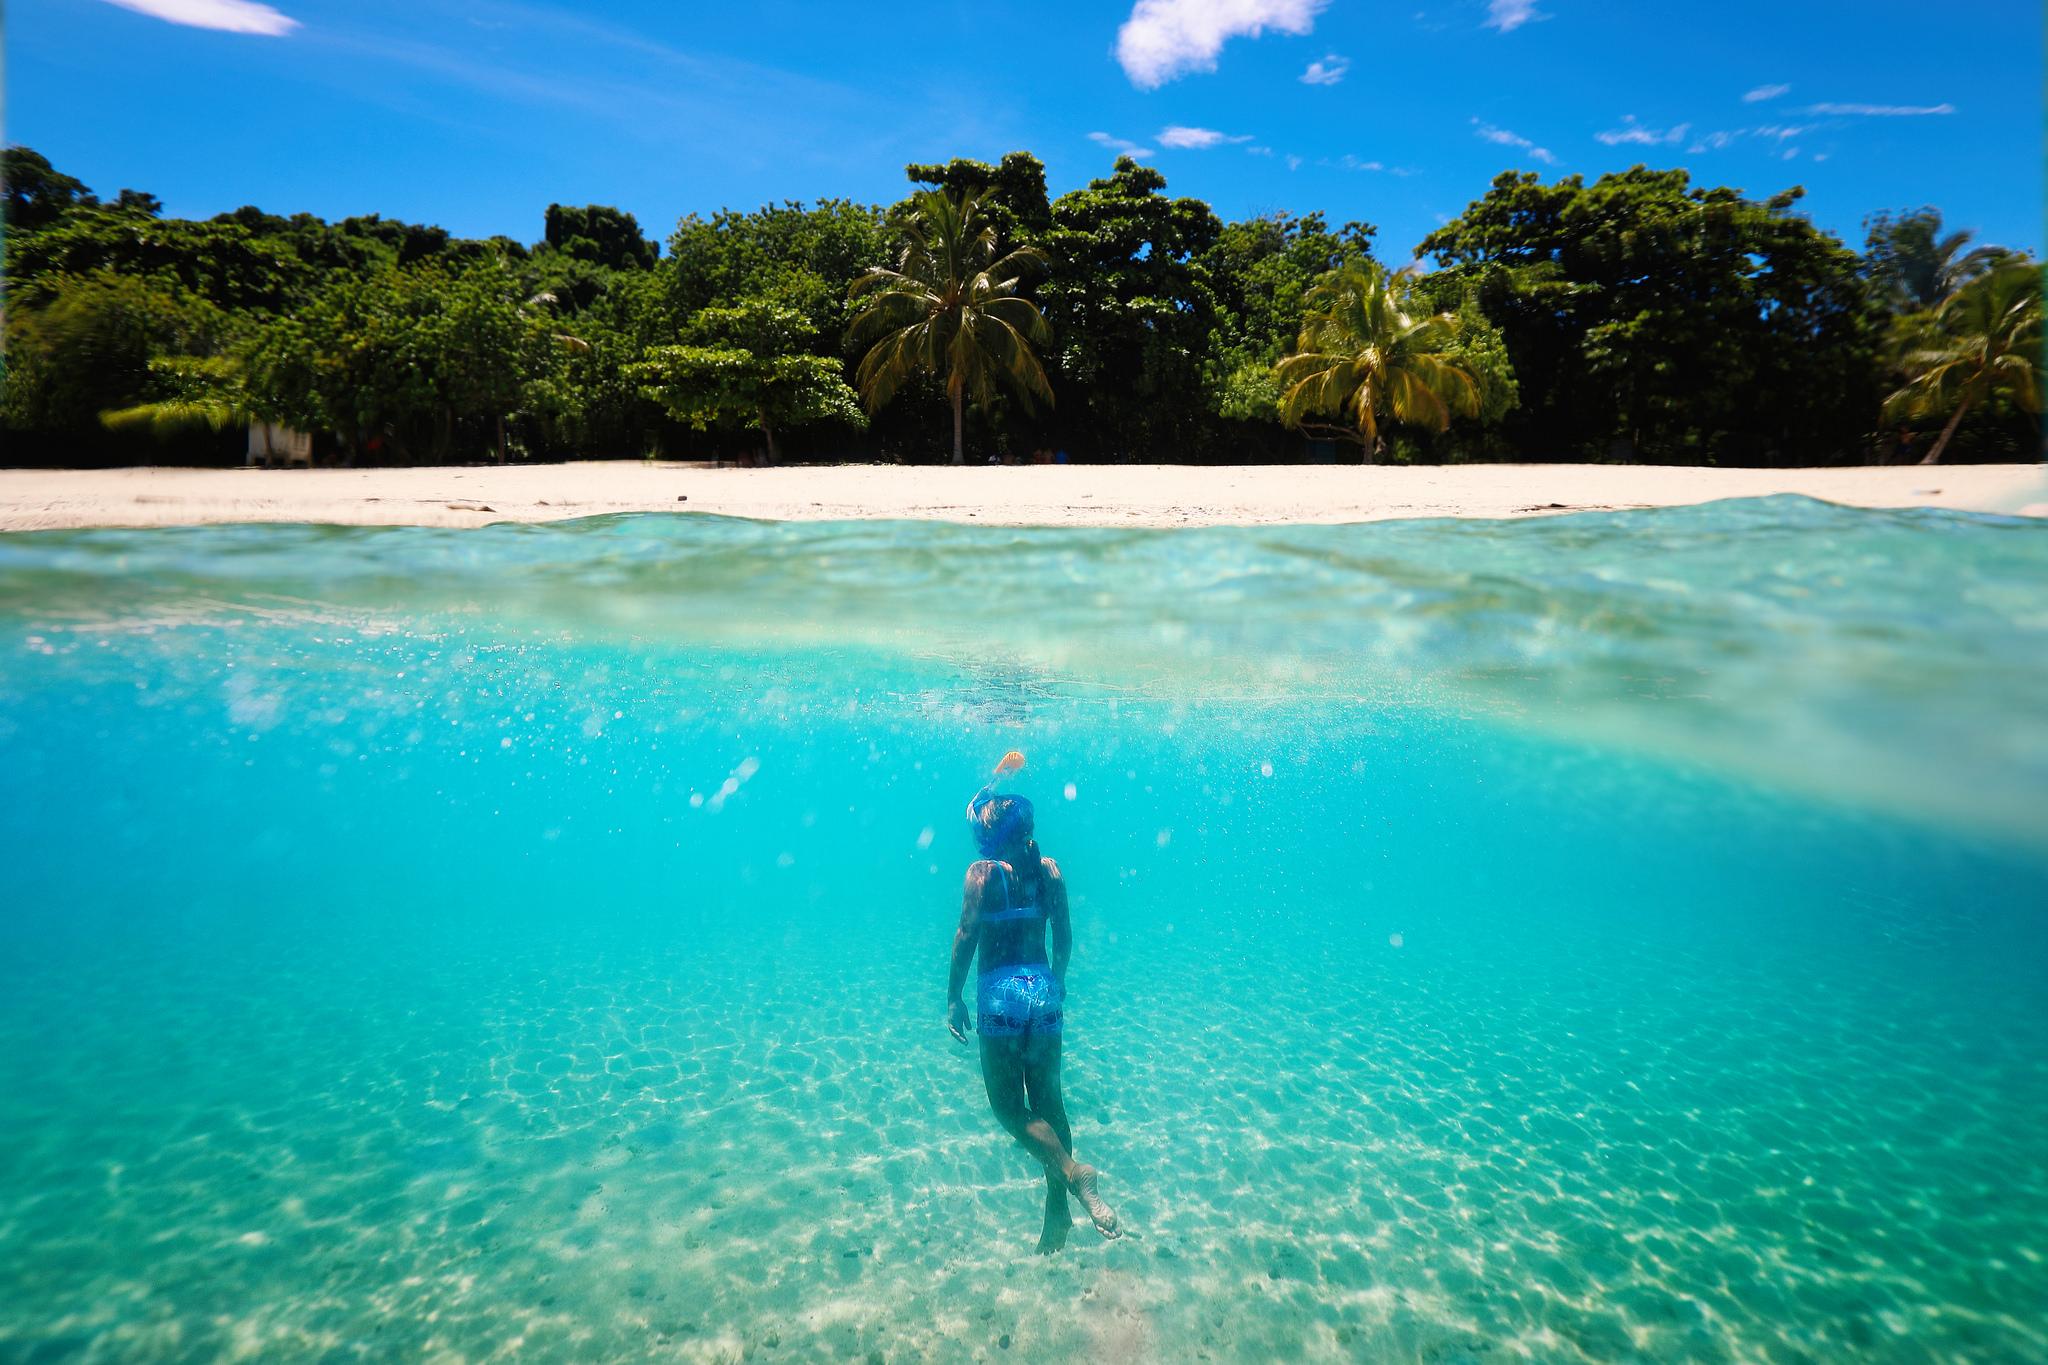 nosy be madagascar snorkelling go pro sous l'ocean